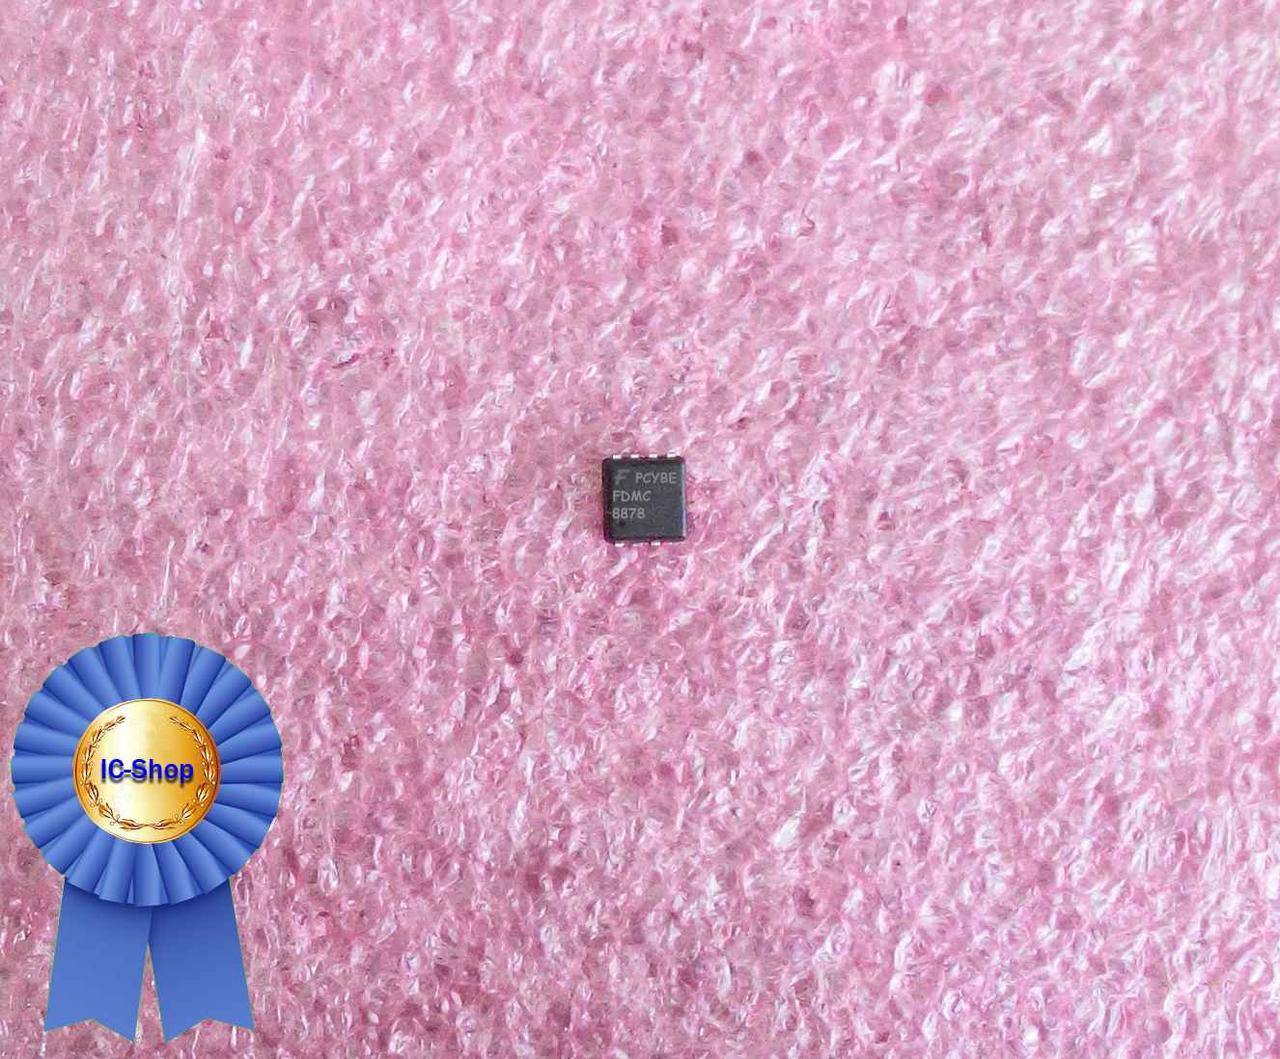 Микросхема FDMC8878